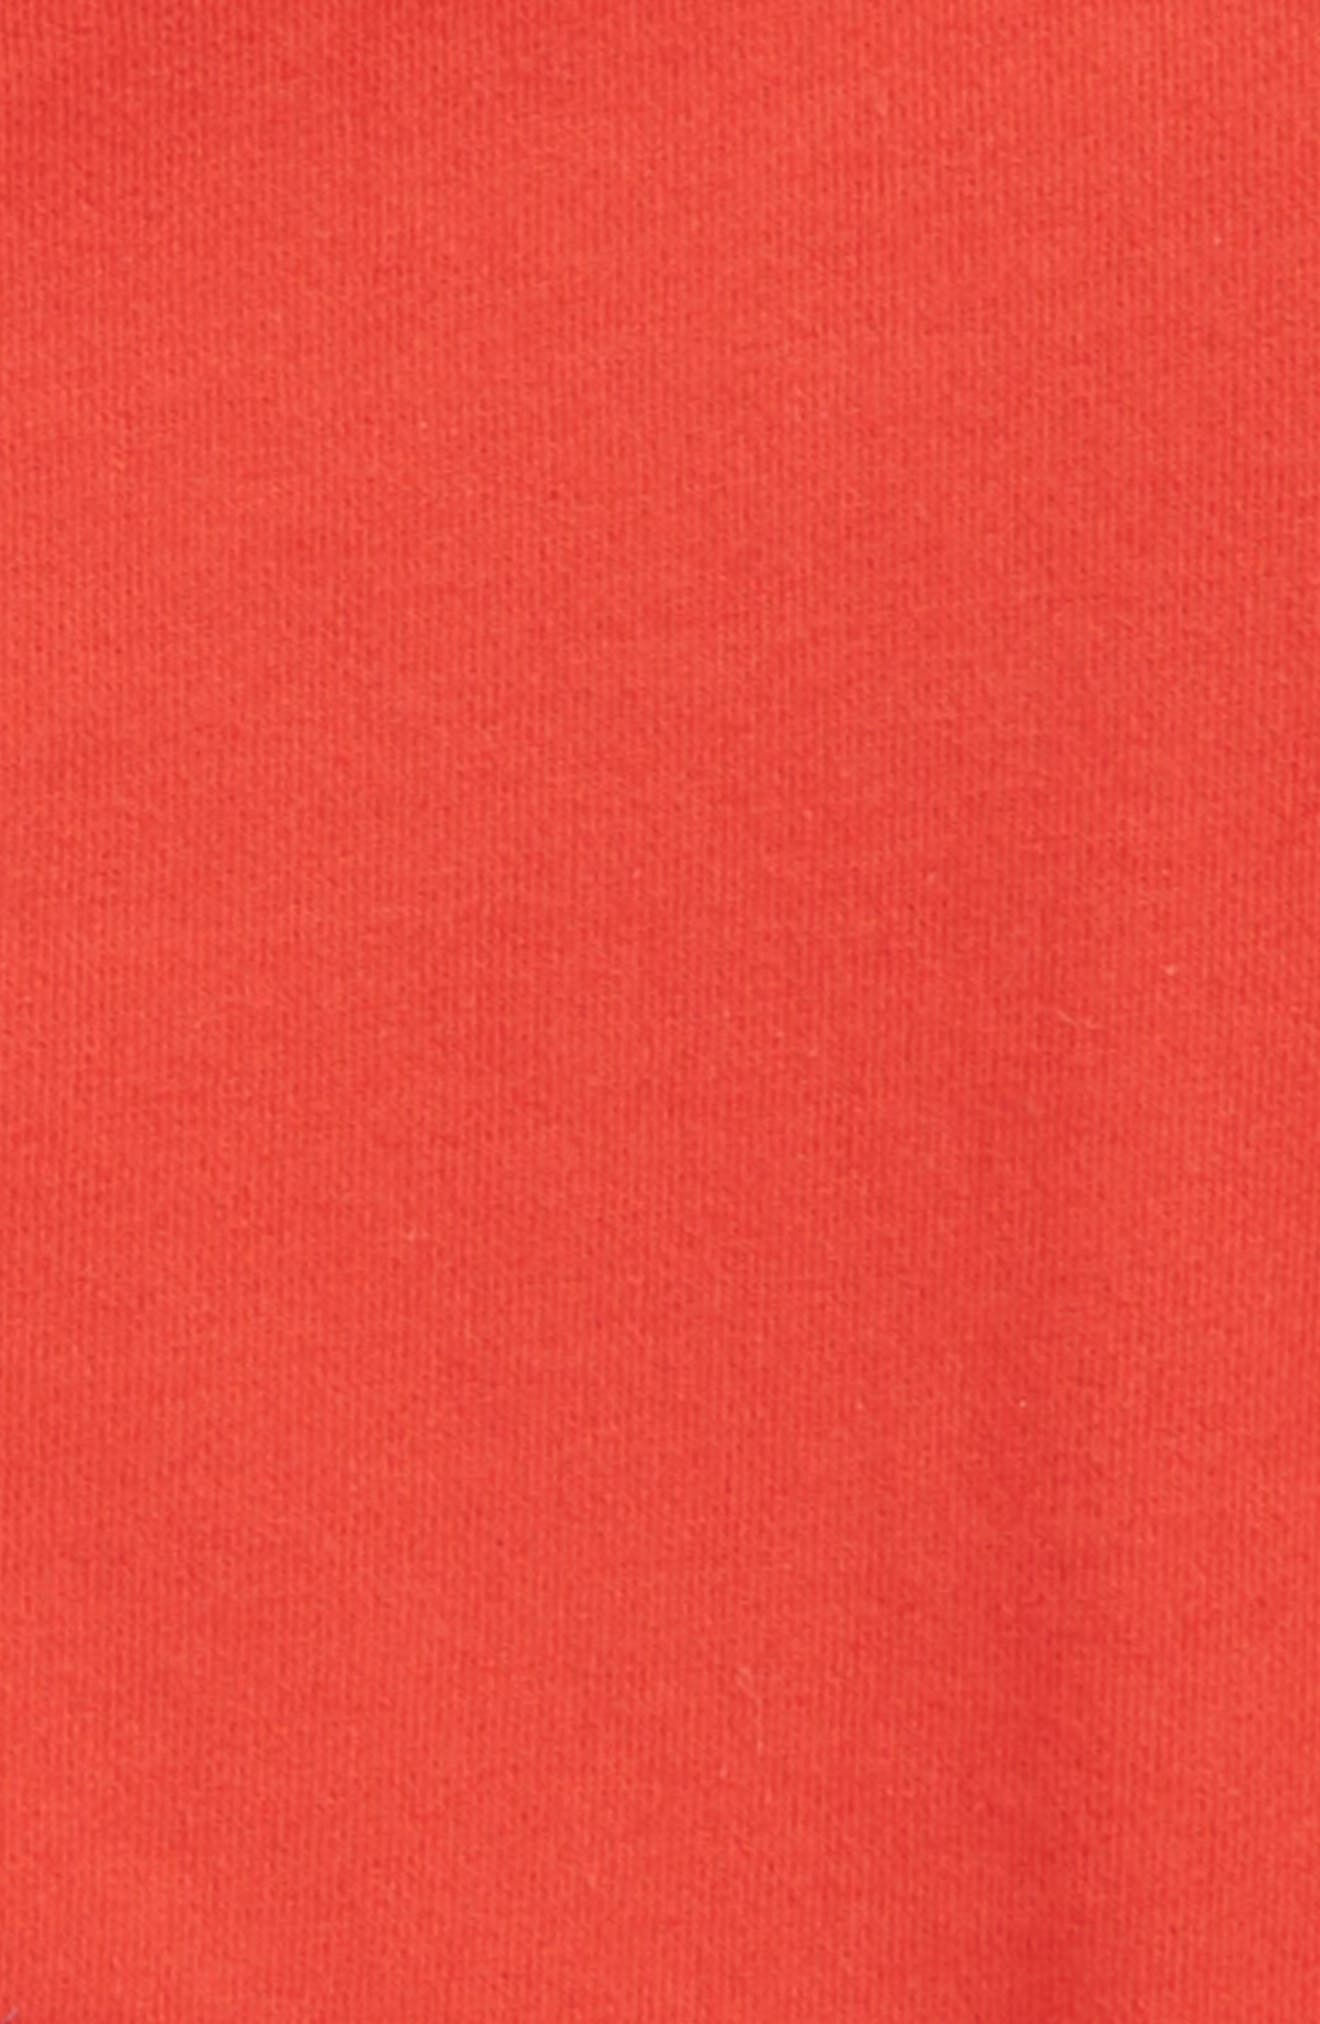 Patchwork Zip Hoodie,                             Alternate thumbnail 2, color,                             Salsa Red